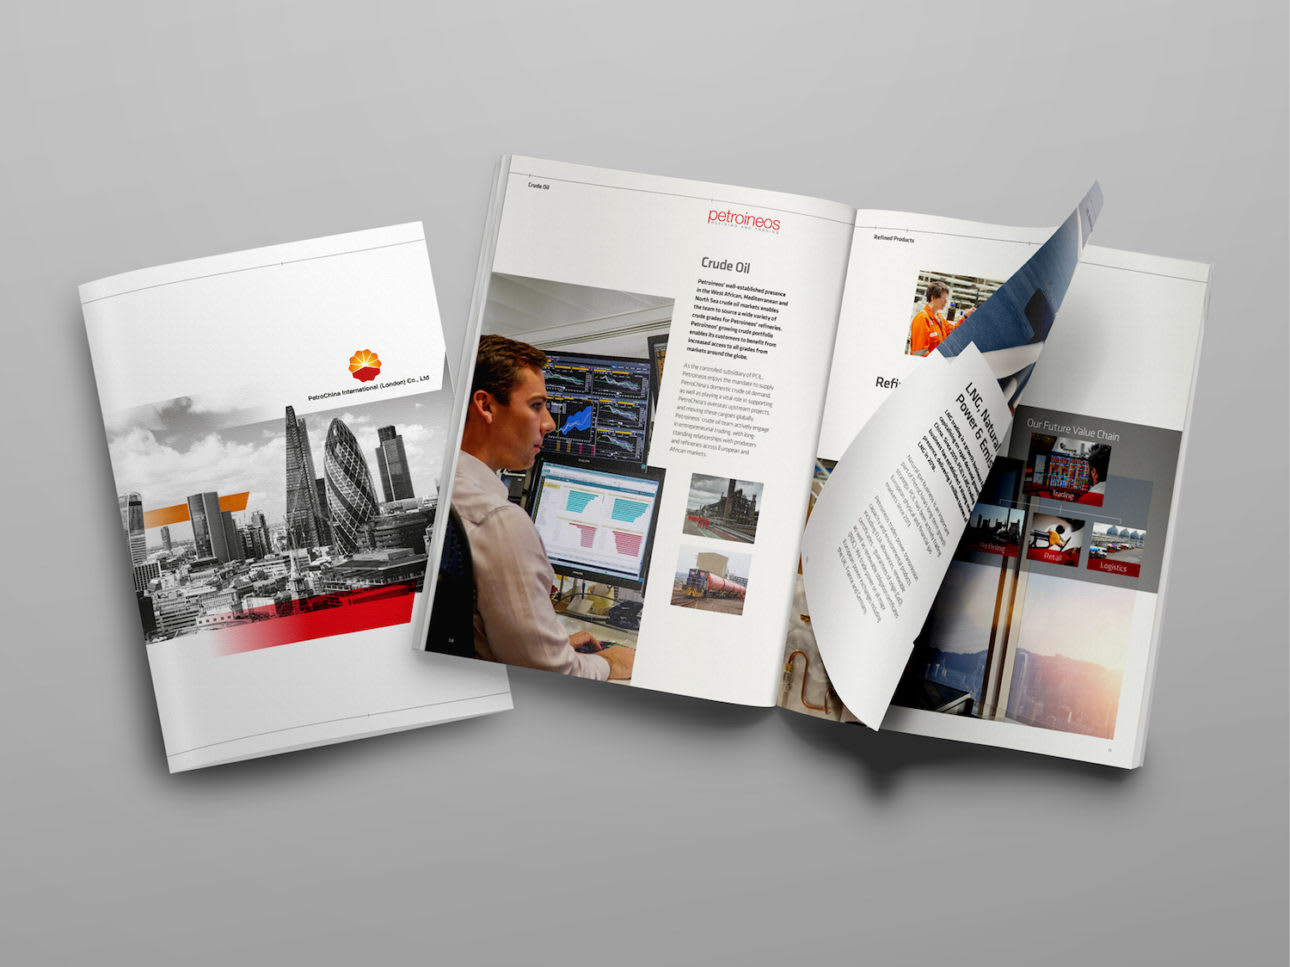 WORK Petroineos Mock Up Brochure